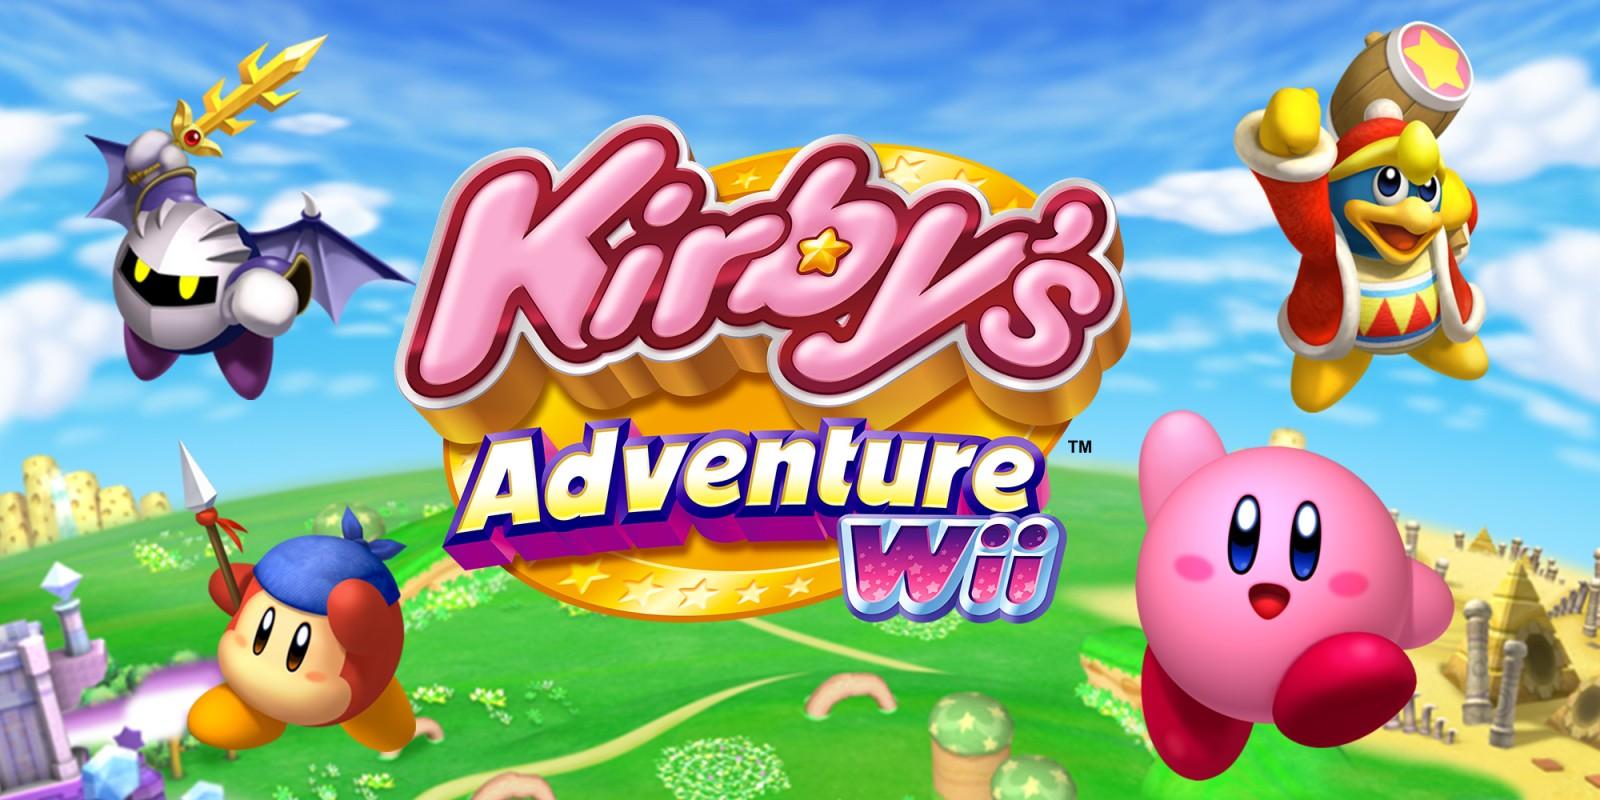 Kirby S Adventure Wii Wii Games Nintendo